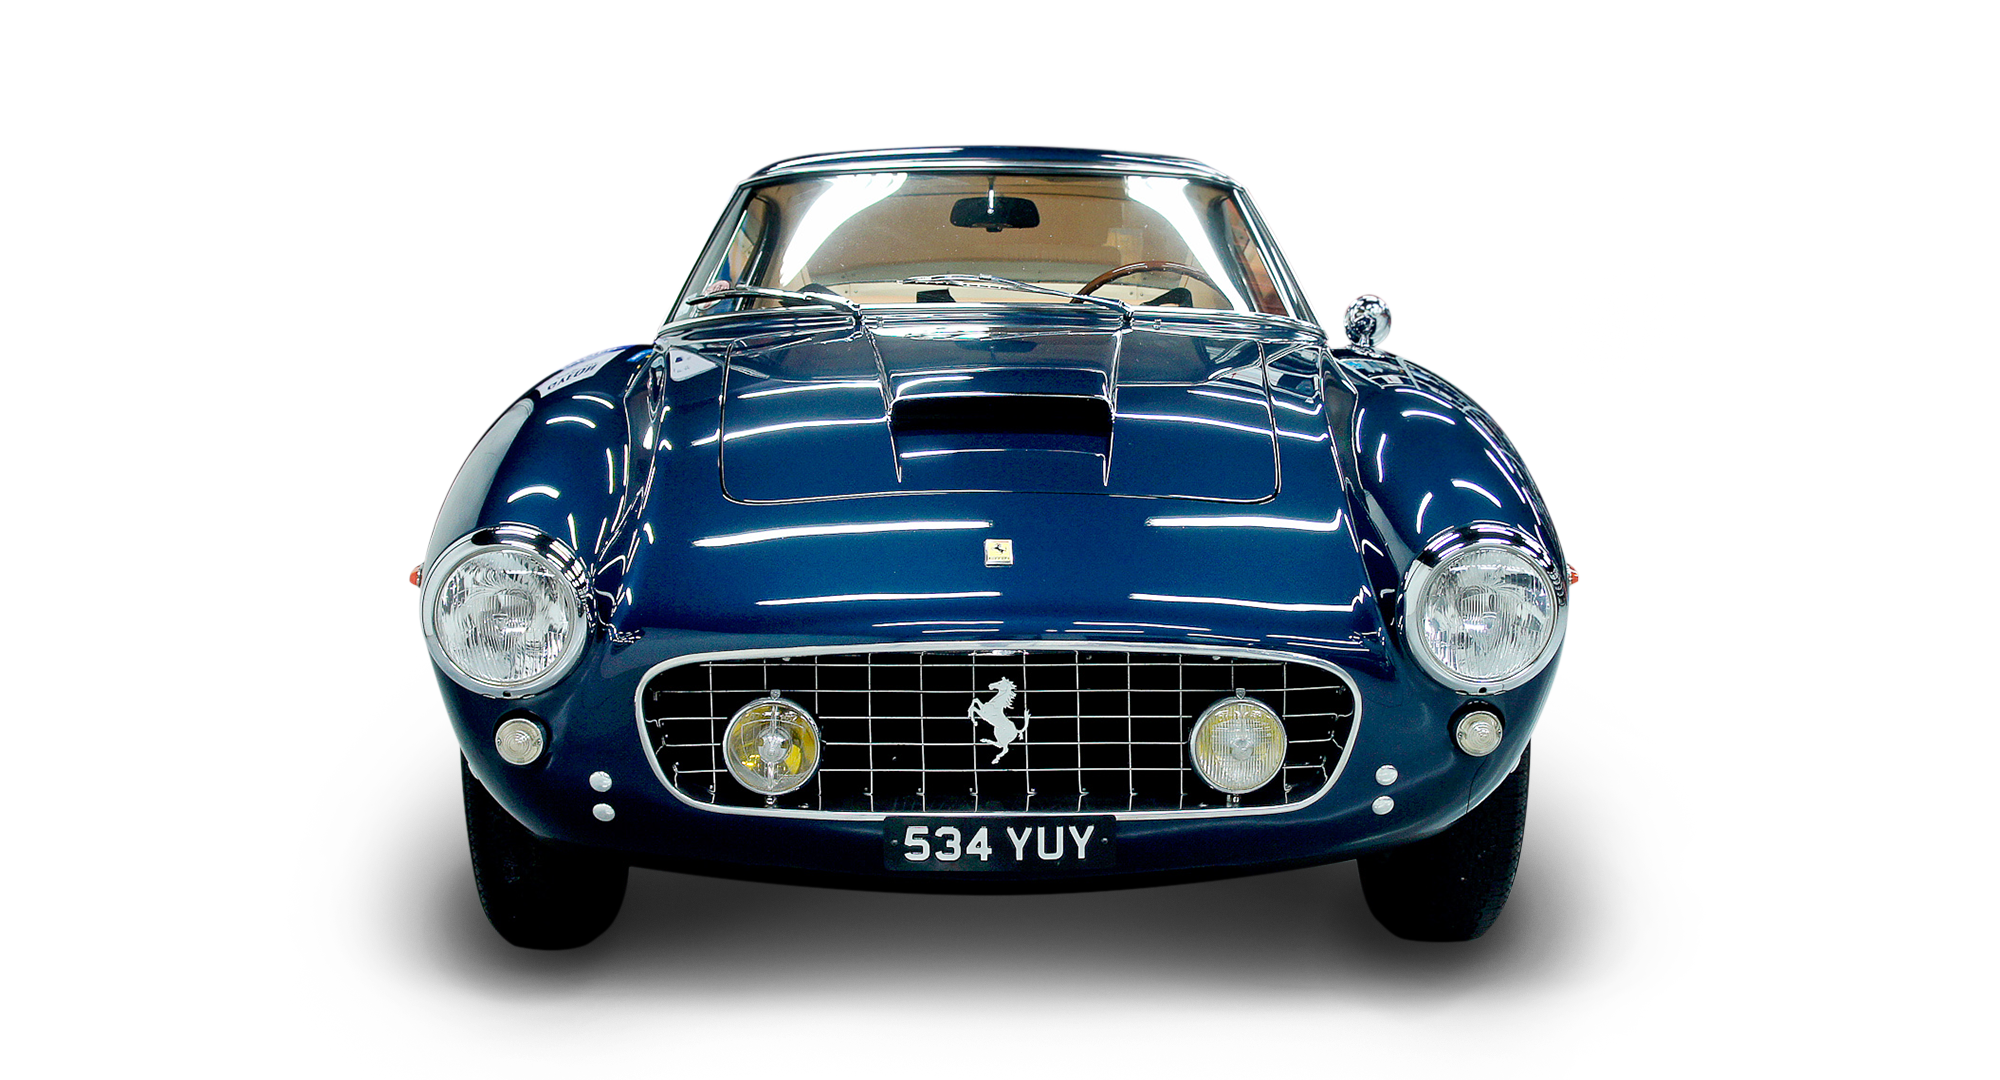 WAX-IT Detailing Ferrari Classic Front